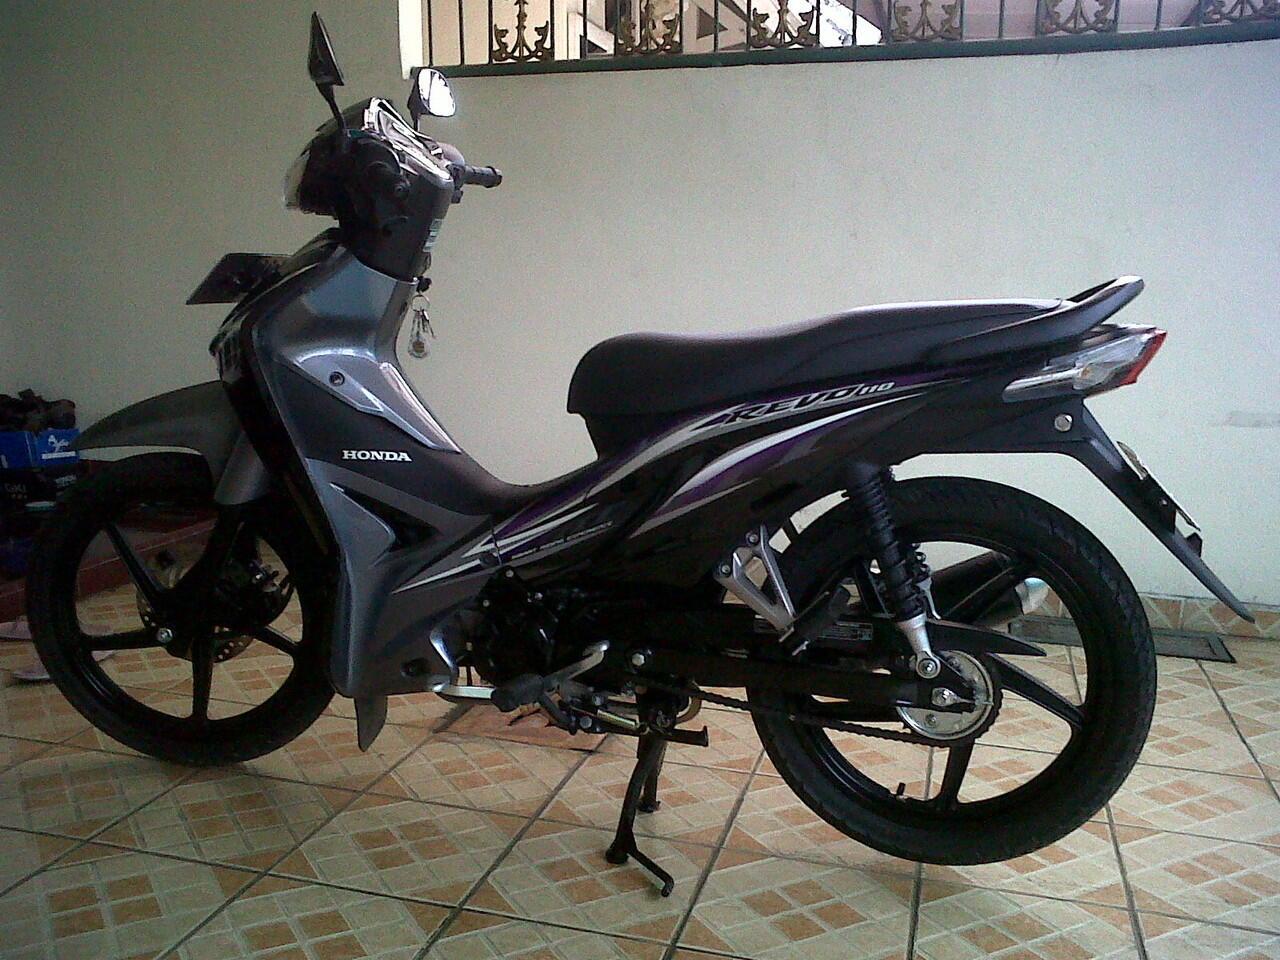 Di Jual Honda Absolute cw 2011 - Hitam